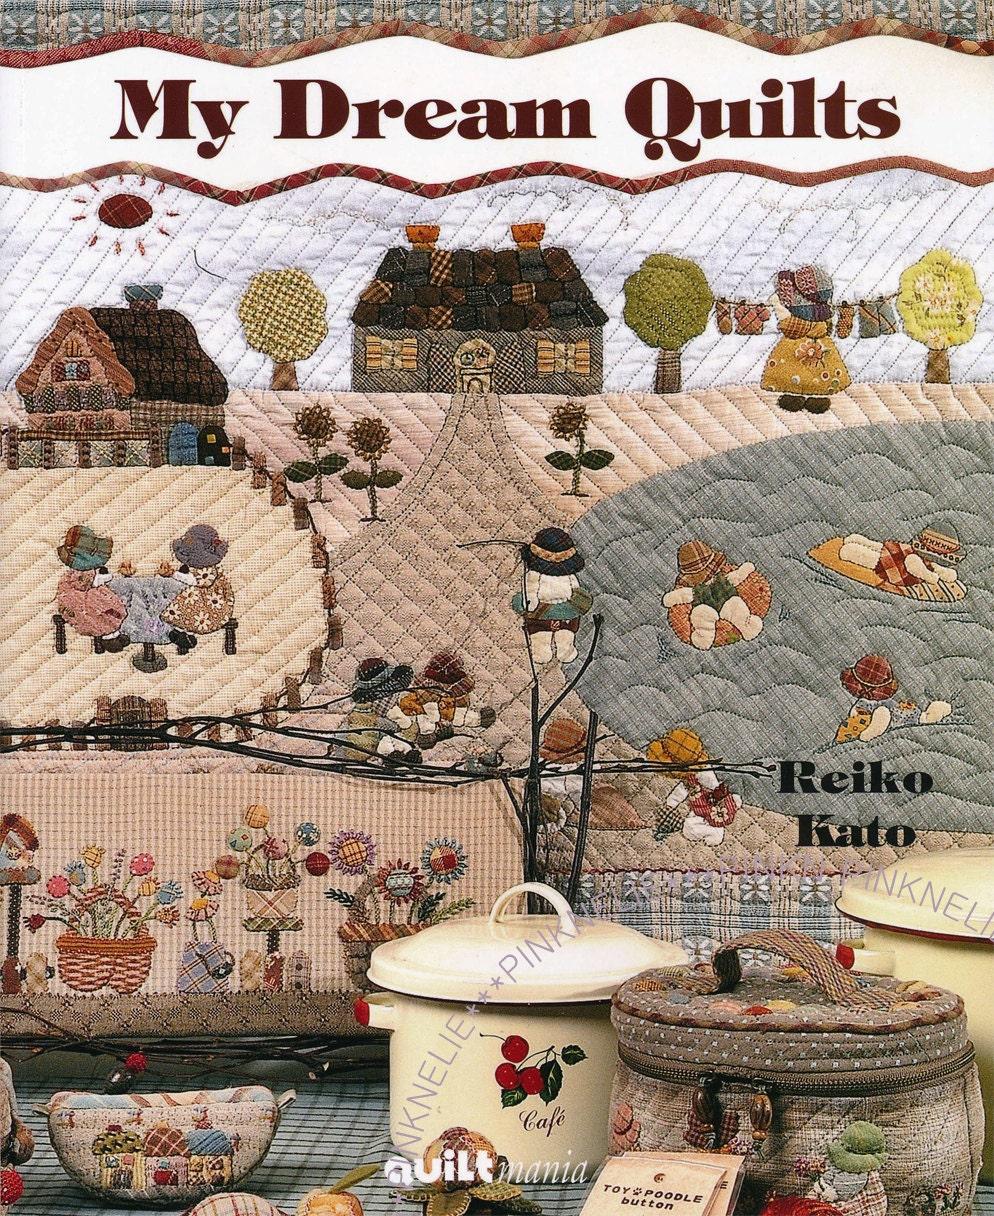 Reiko kato my dream quilts patchwork english french craft book - Reiko kato patchwork ...